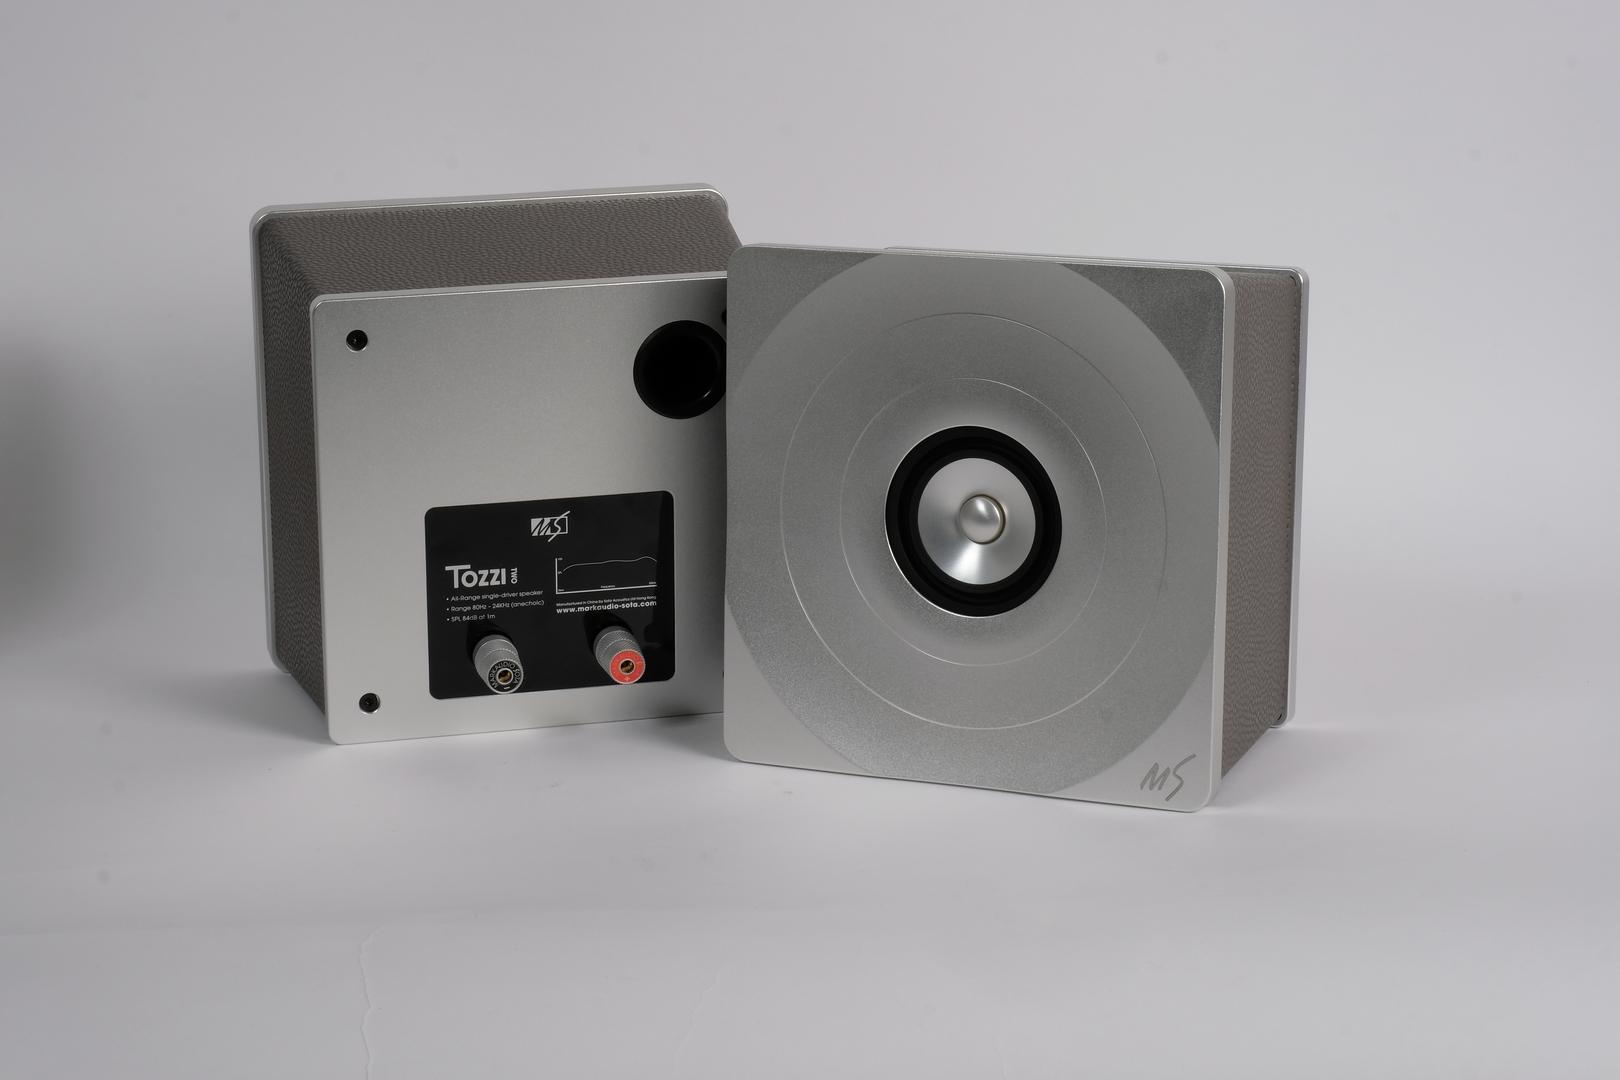 Markaudio-Sota Tozzi Two standmount loudspeaker